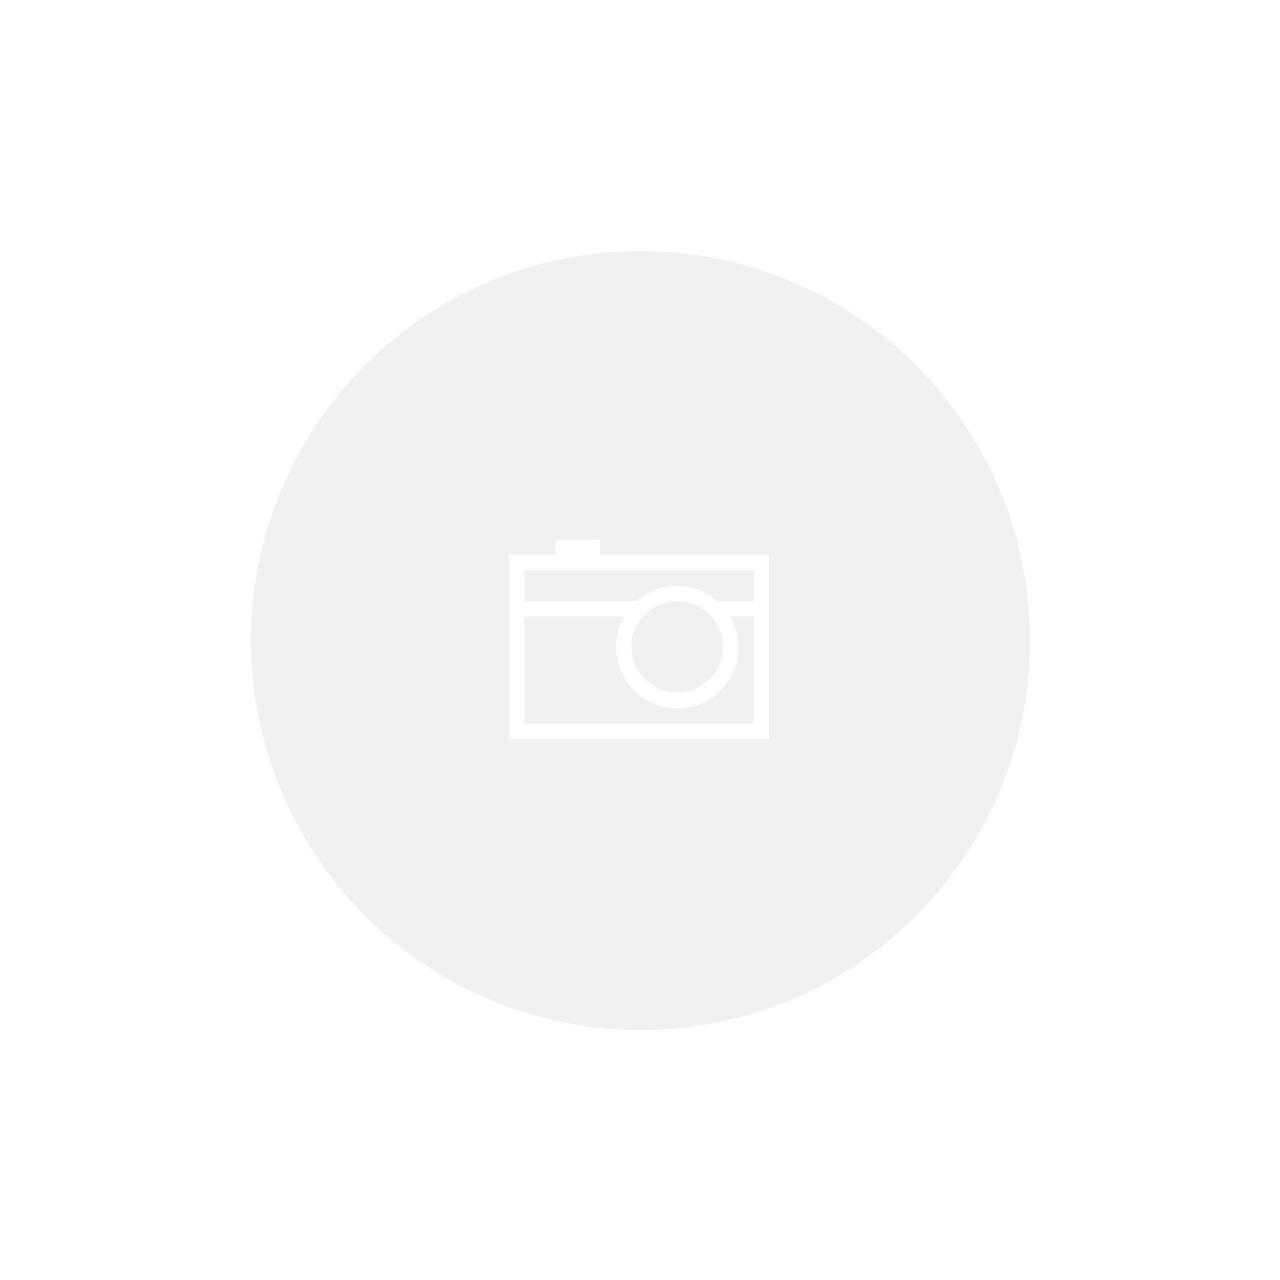 Panela Cocotte Inox 12Cm 0,76 Litros Trix Tramontina